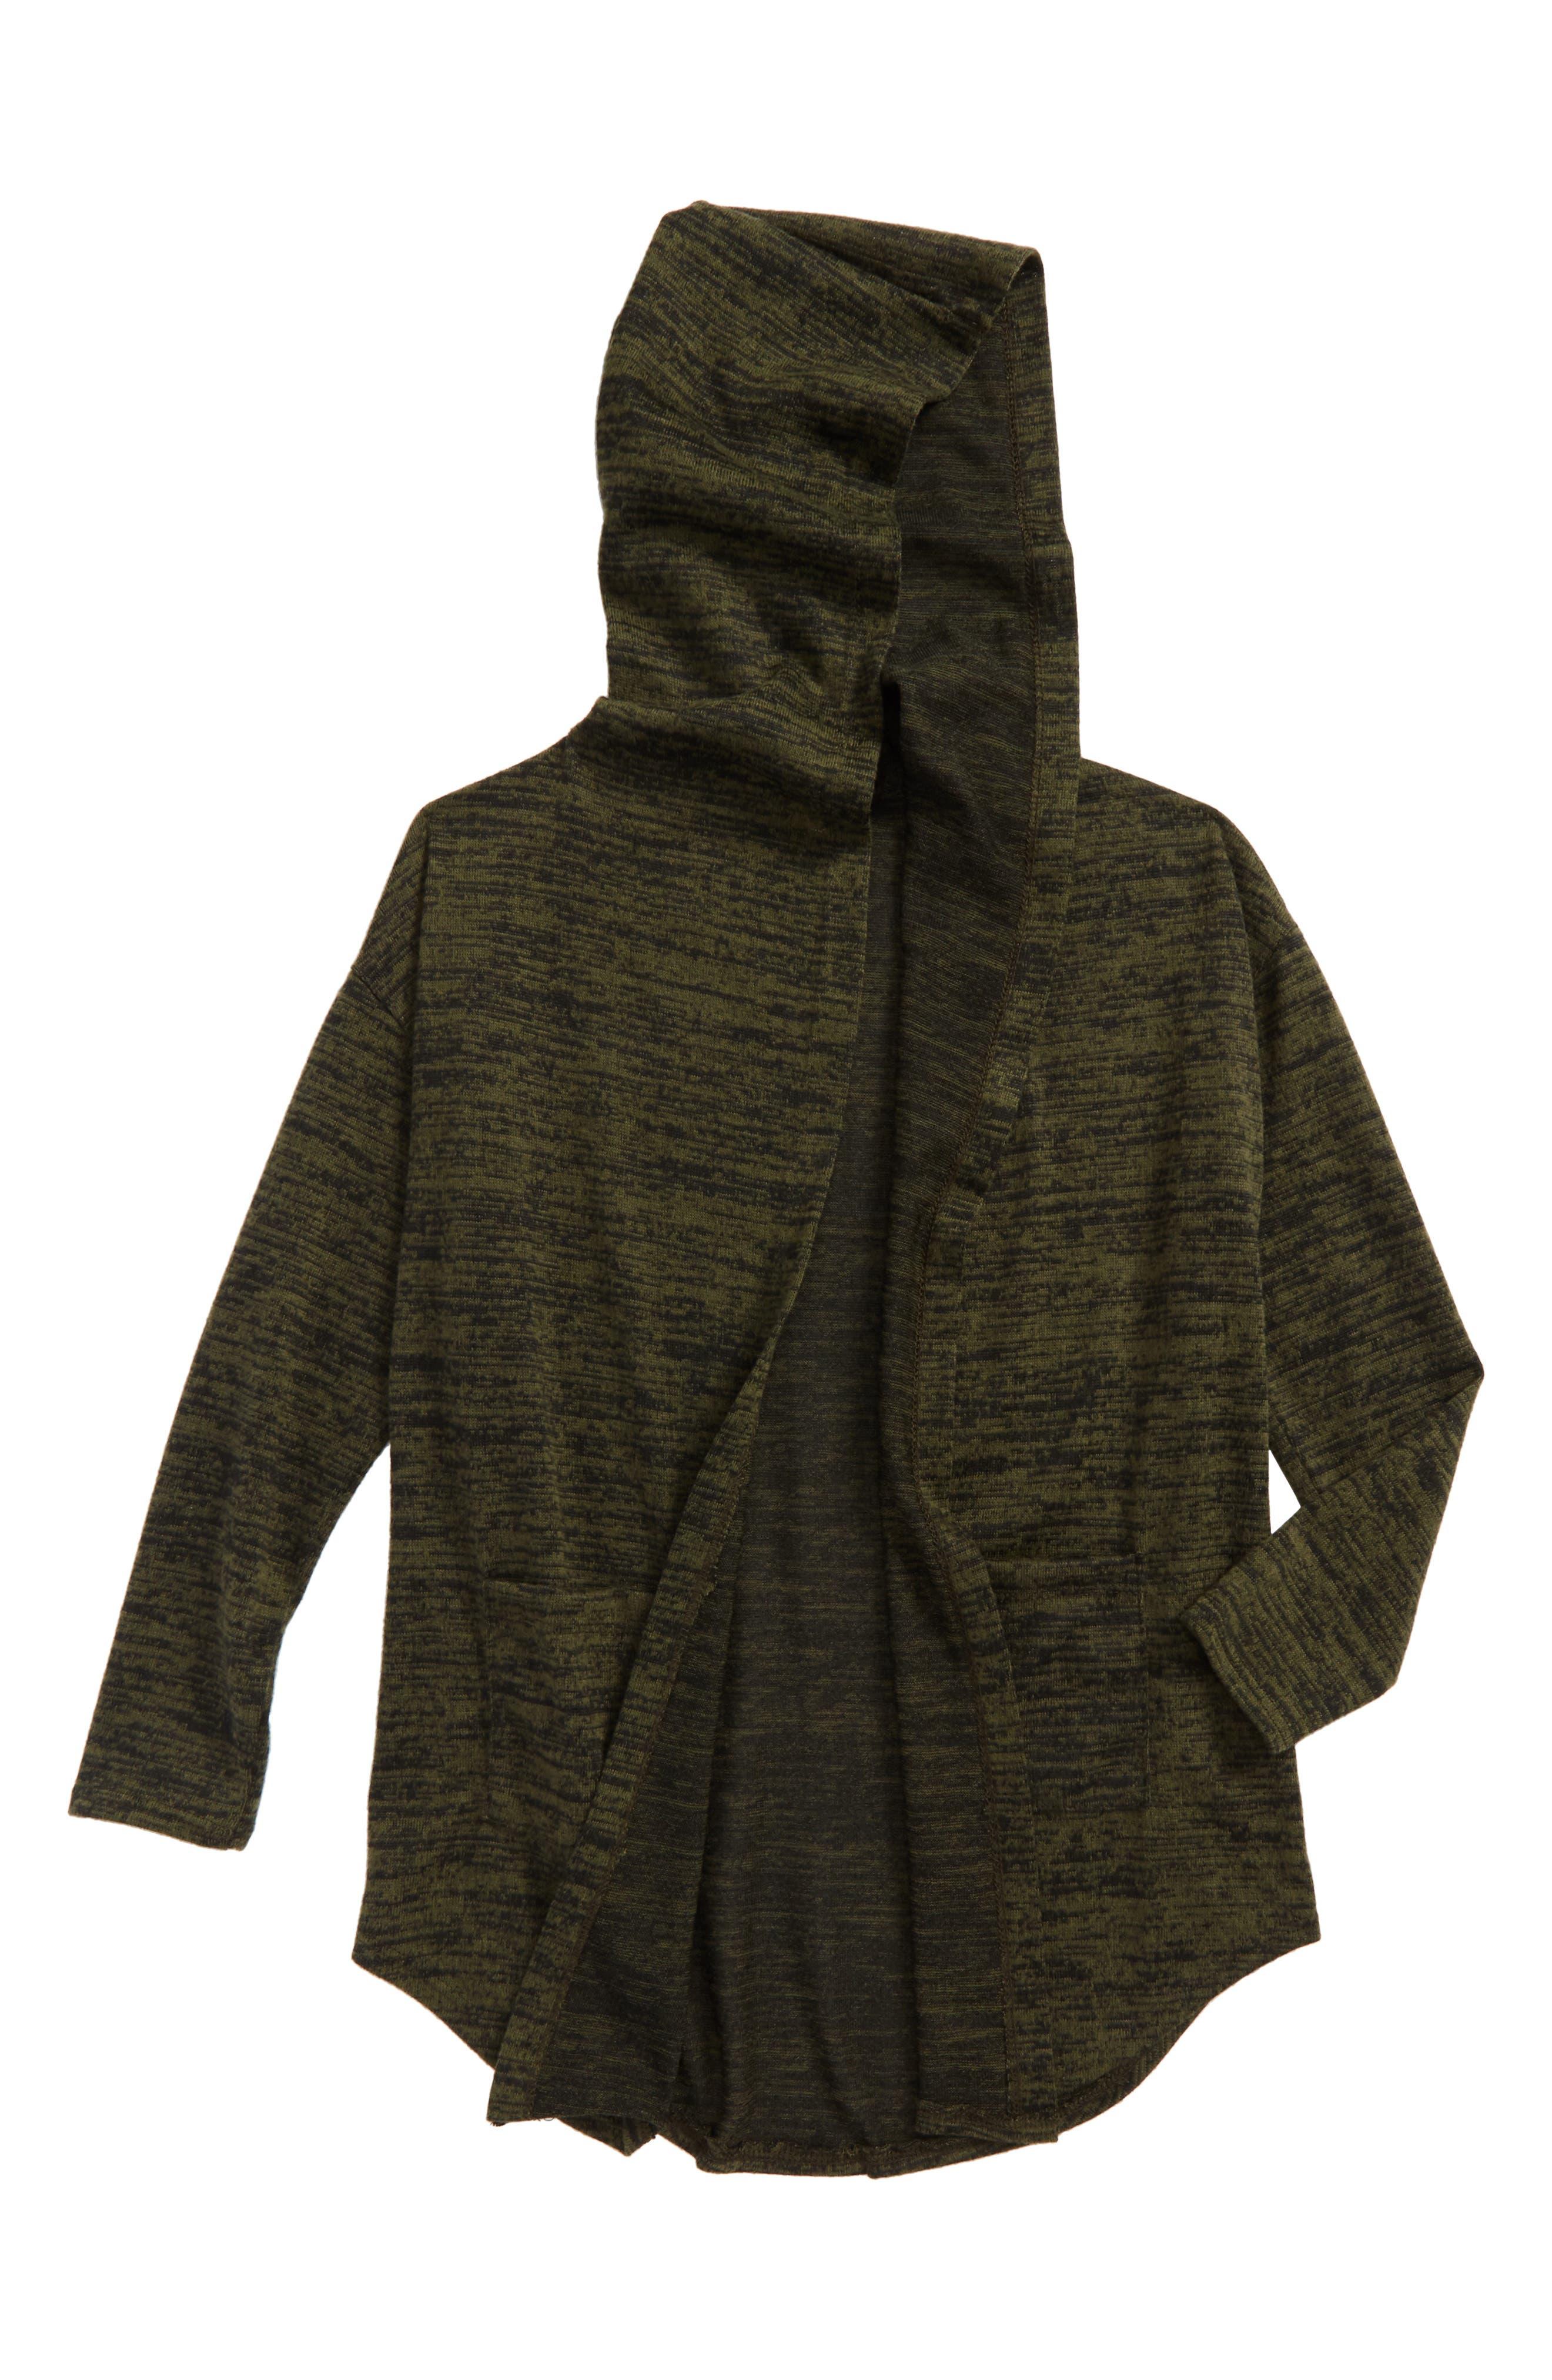 Main Image - Soprano Hooded Cardigan (Big Girls)